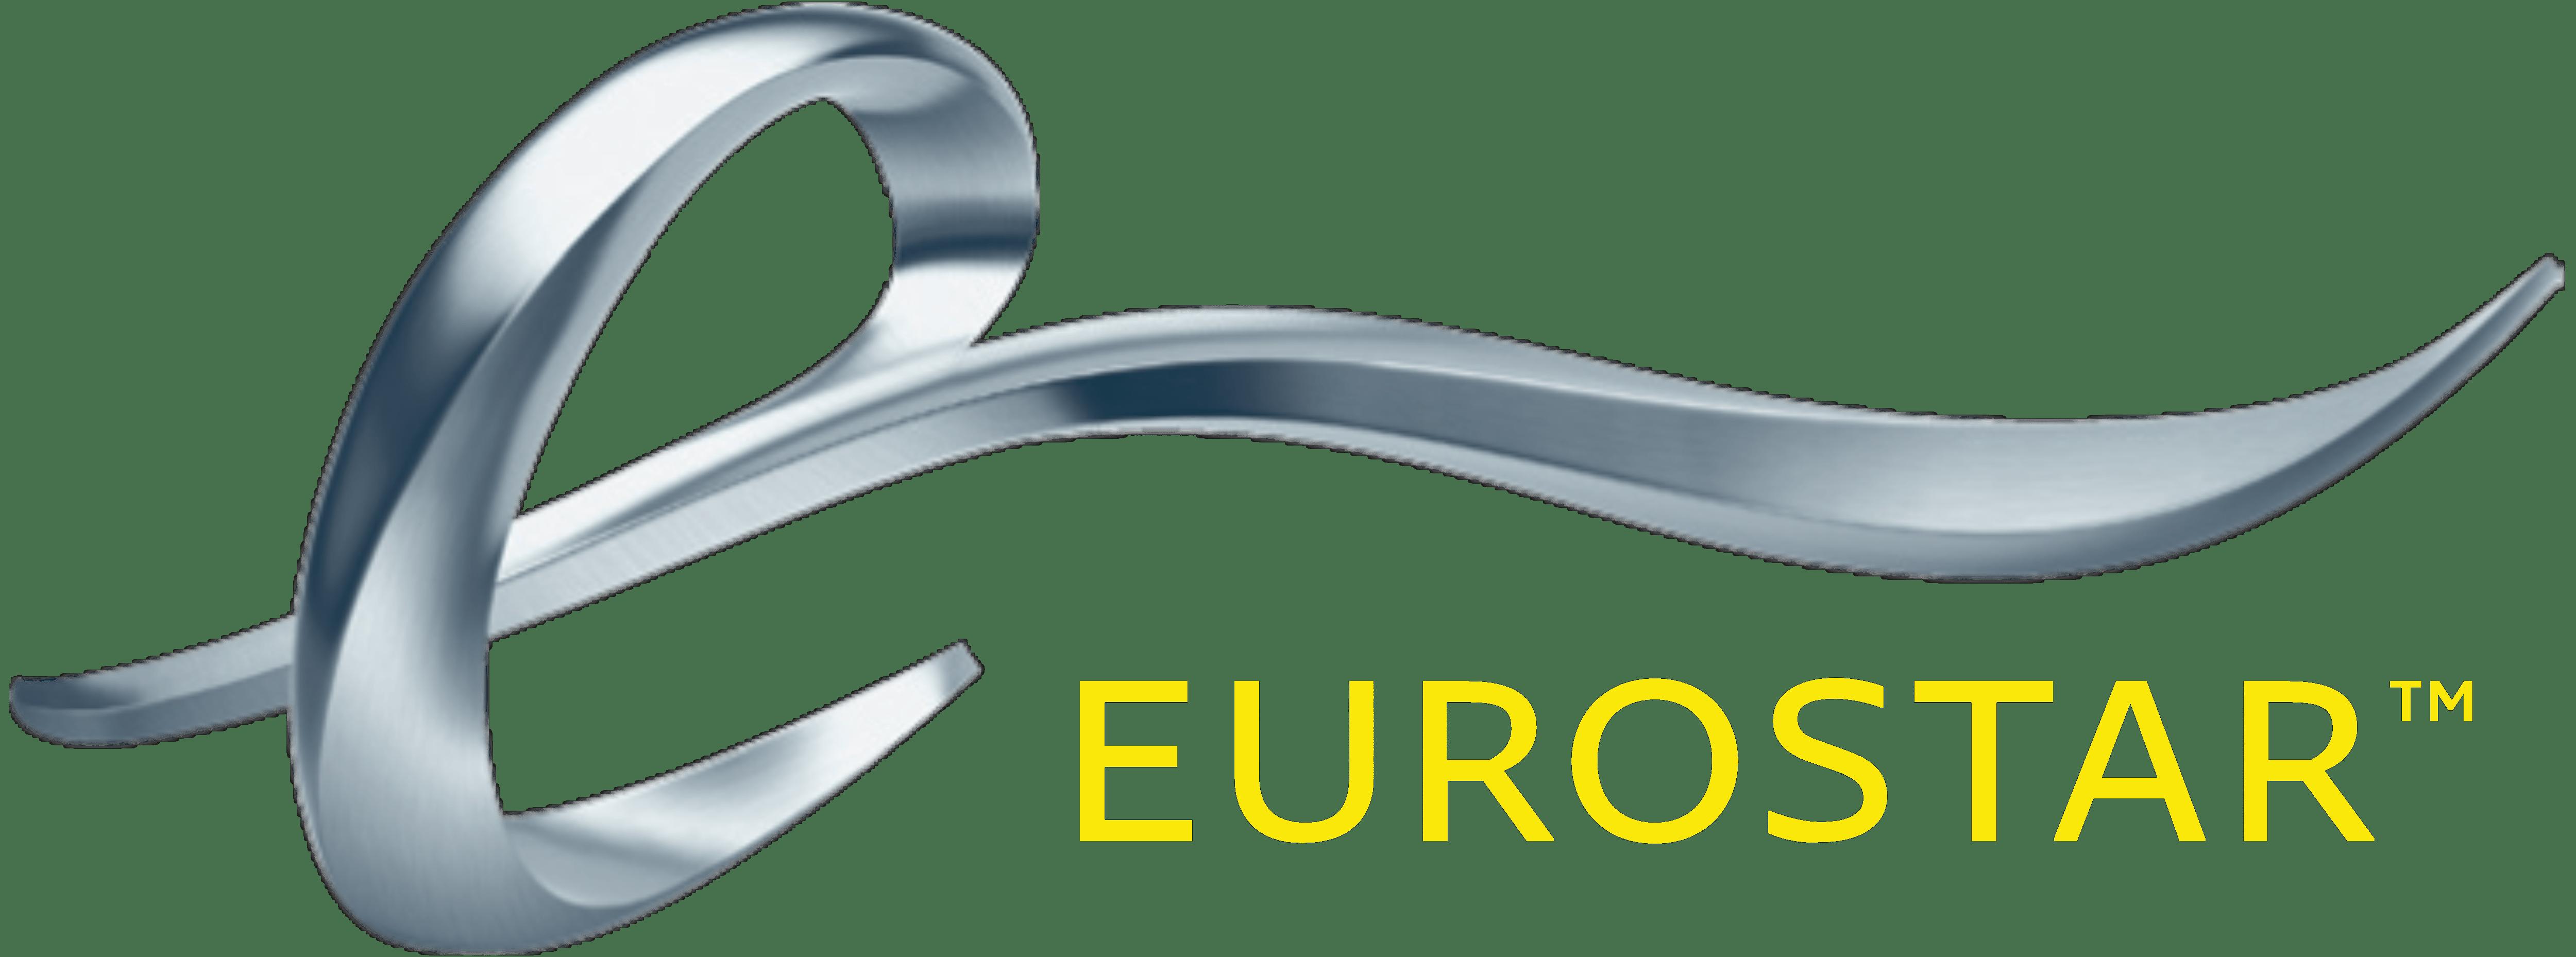 Eurostar Logo transparent PNG.